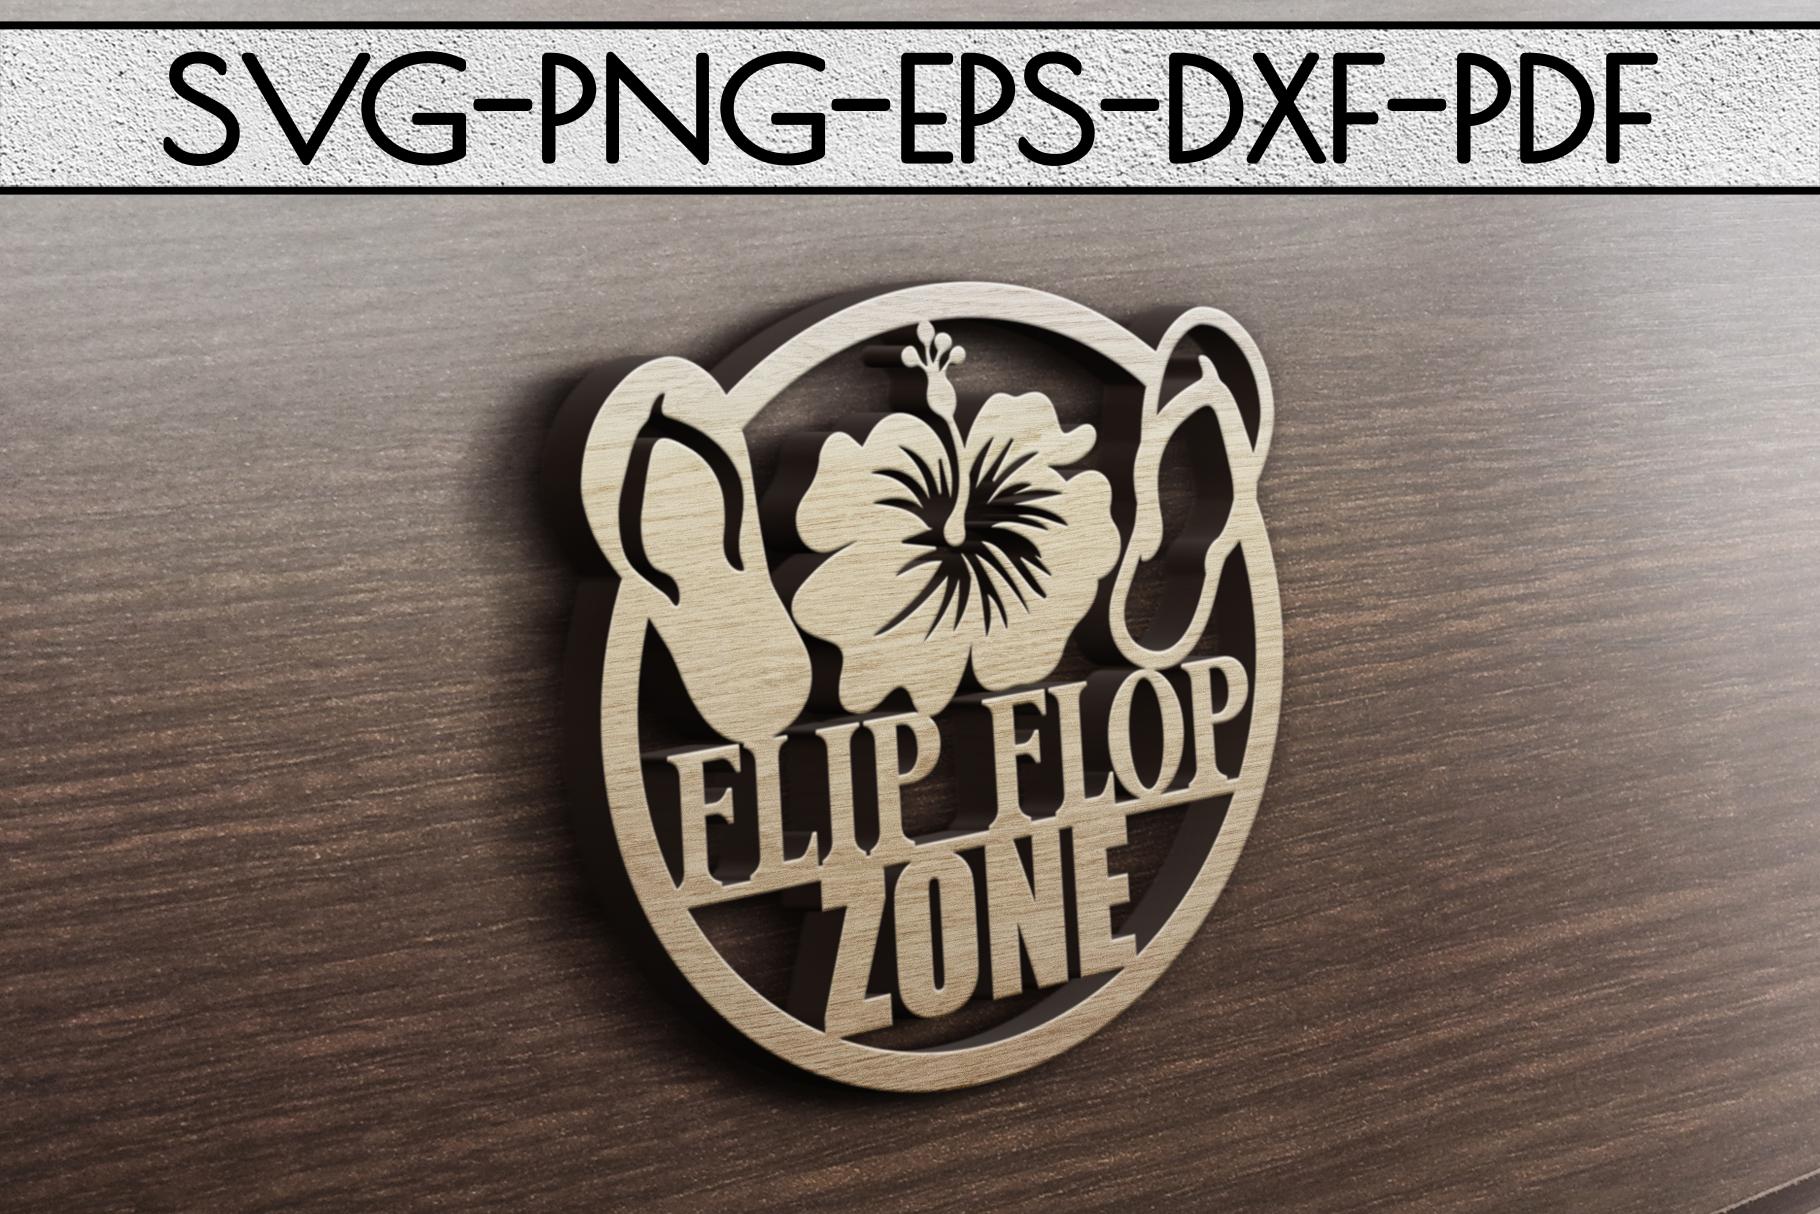 Flip Flop Zone Papercut Template, Beach House Decor SVG, DXF example image 3